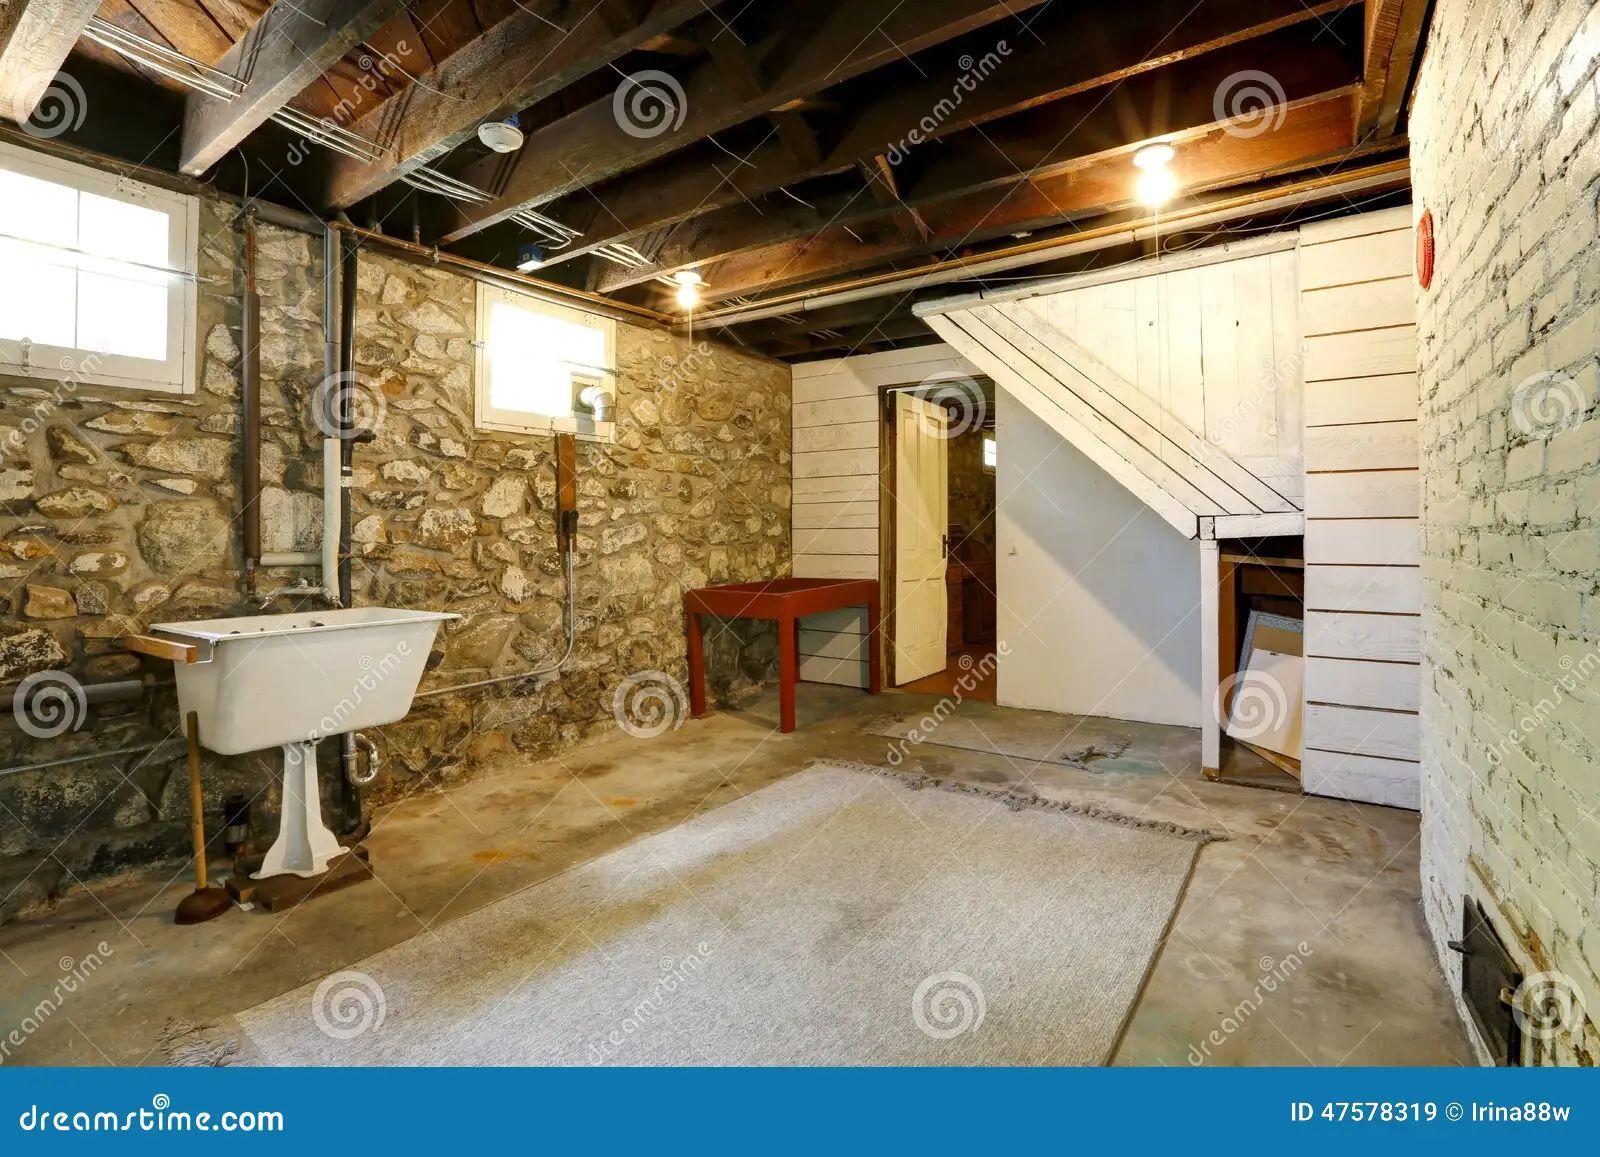 Cif power amp shine bathroom - Download